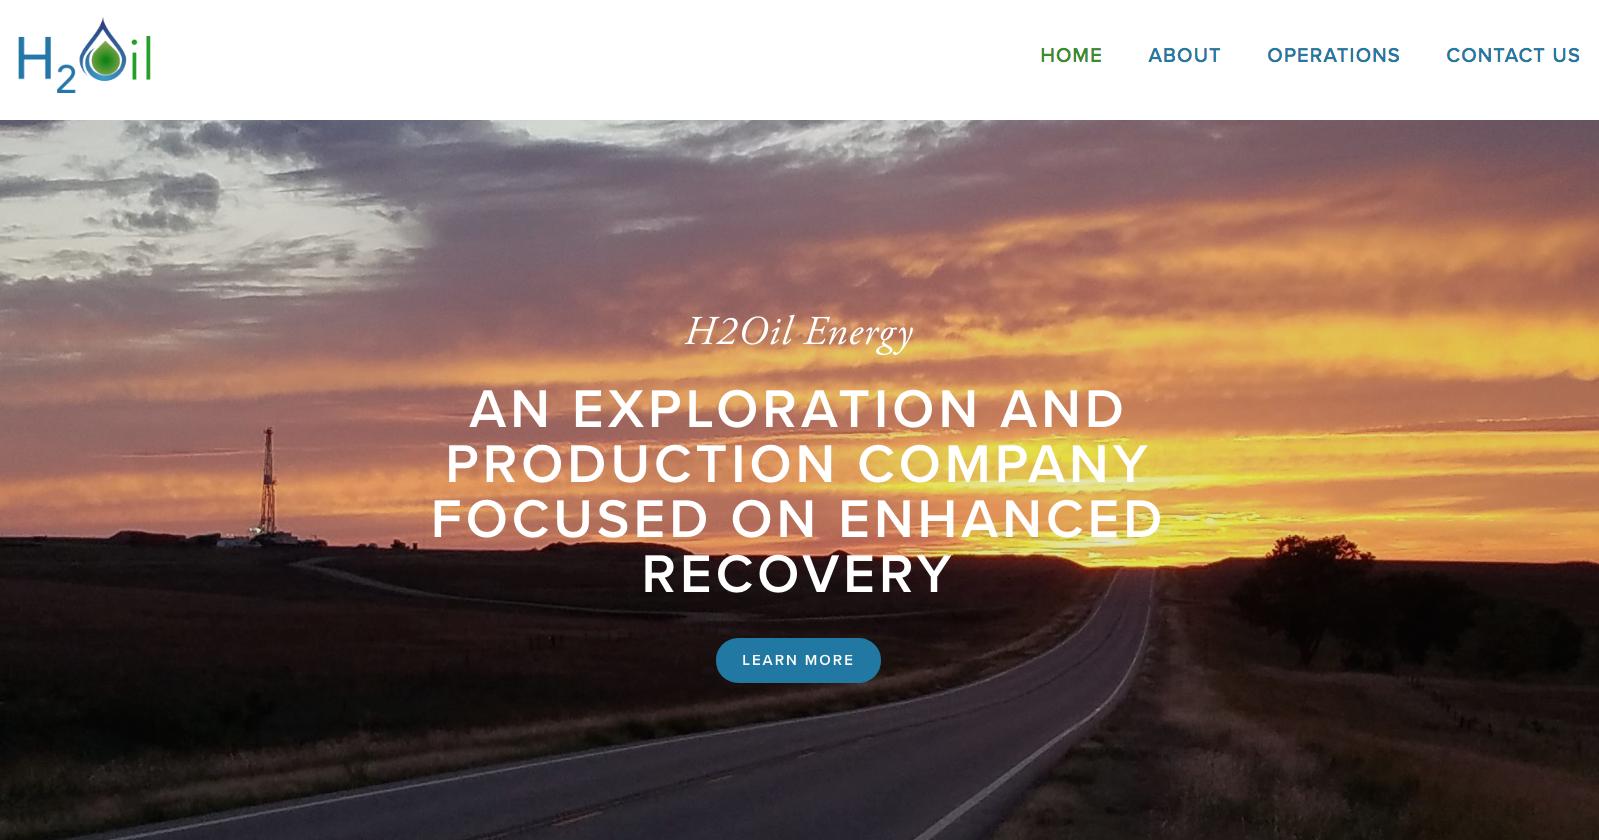 Oil & Gas Houston, TX | Wichita Falls, TX | Small Business Marketing